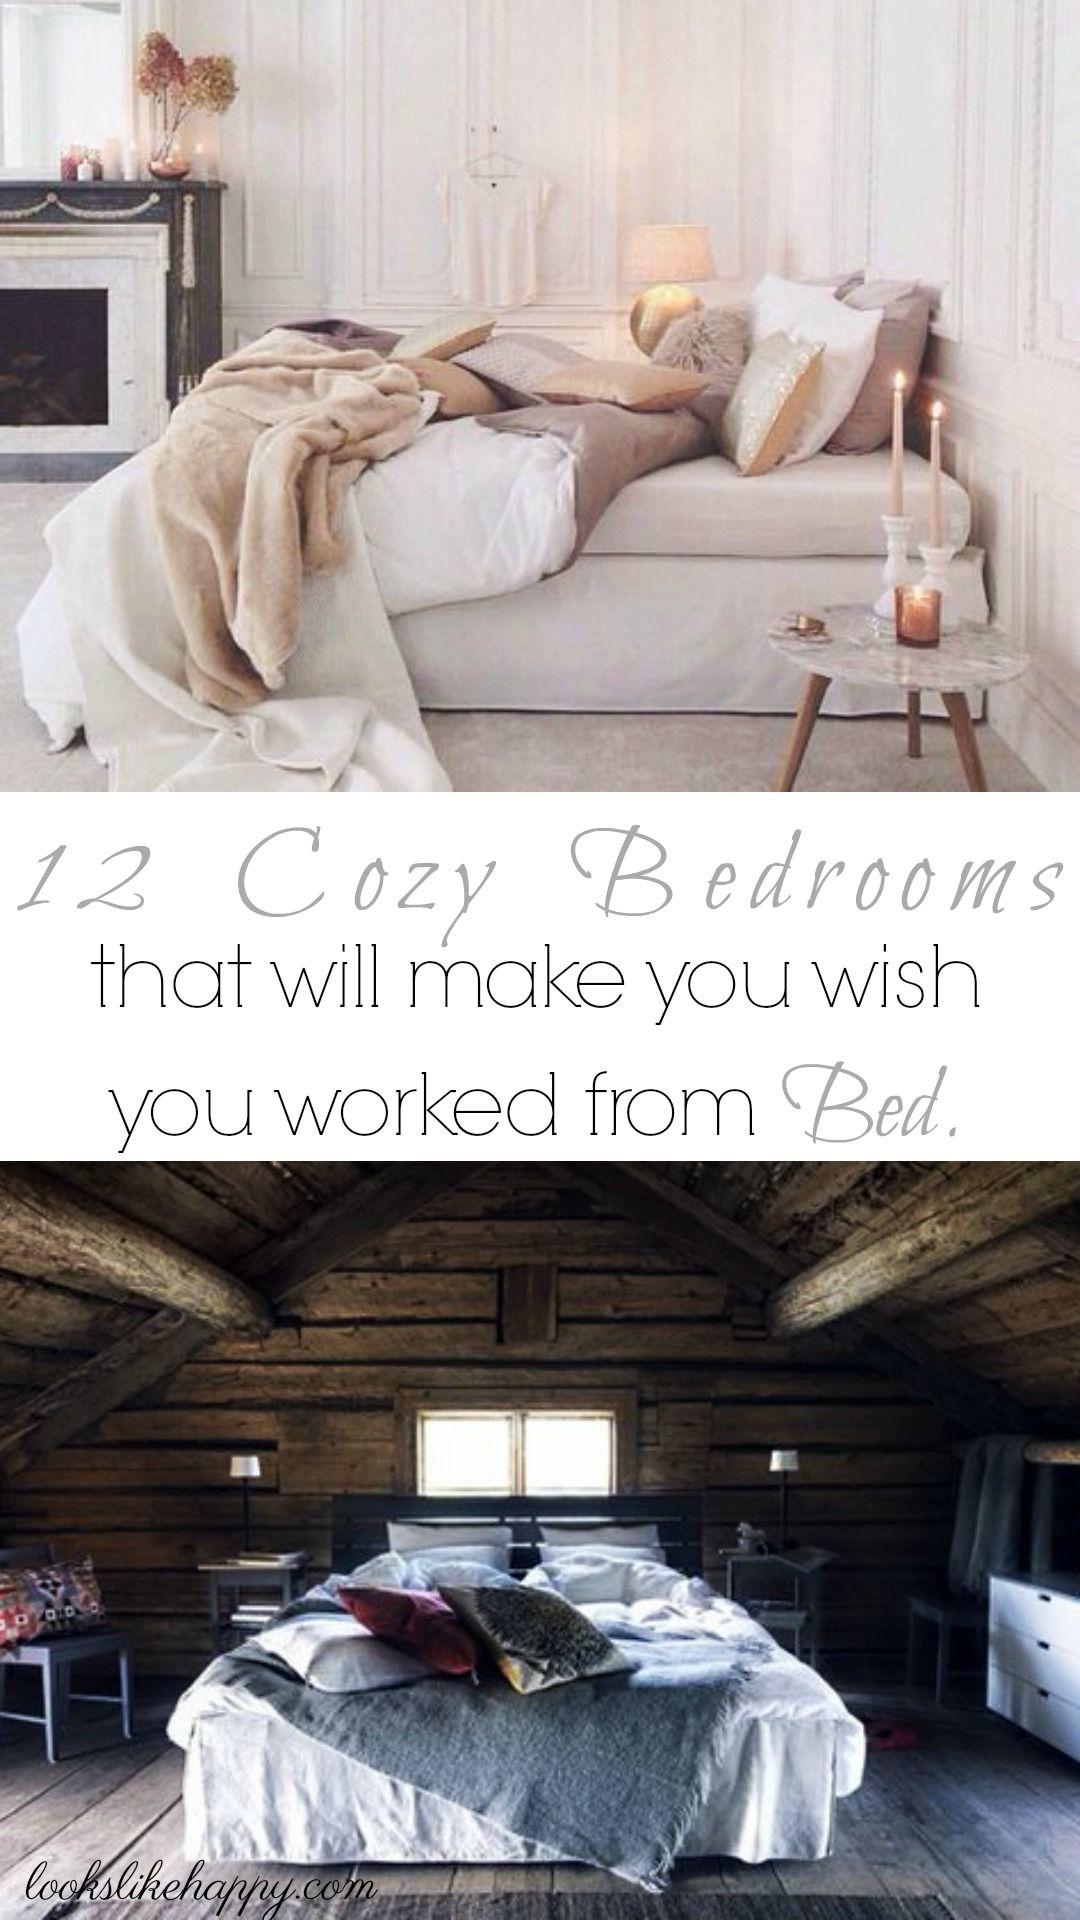 12 Cozy Bedroom Ideas How To Make Your Bedroom Cozy